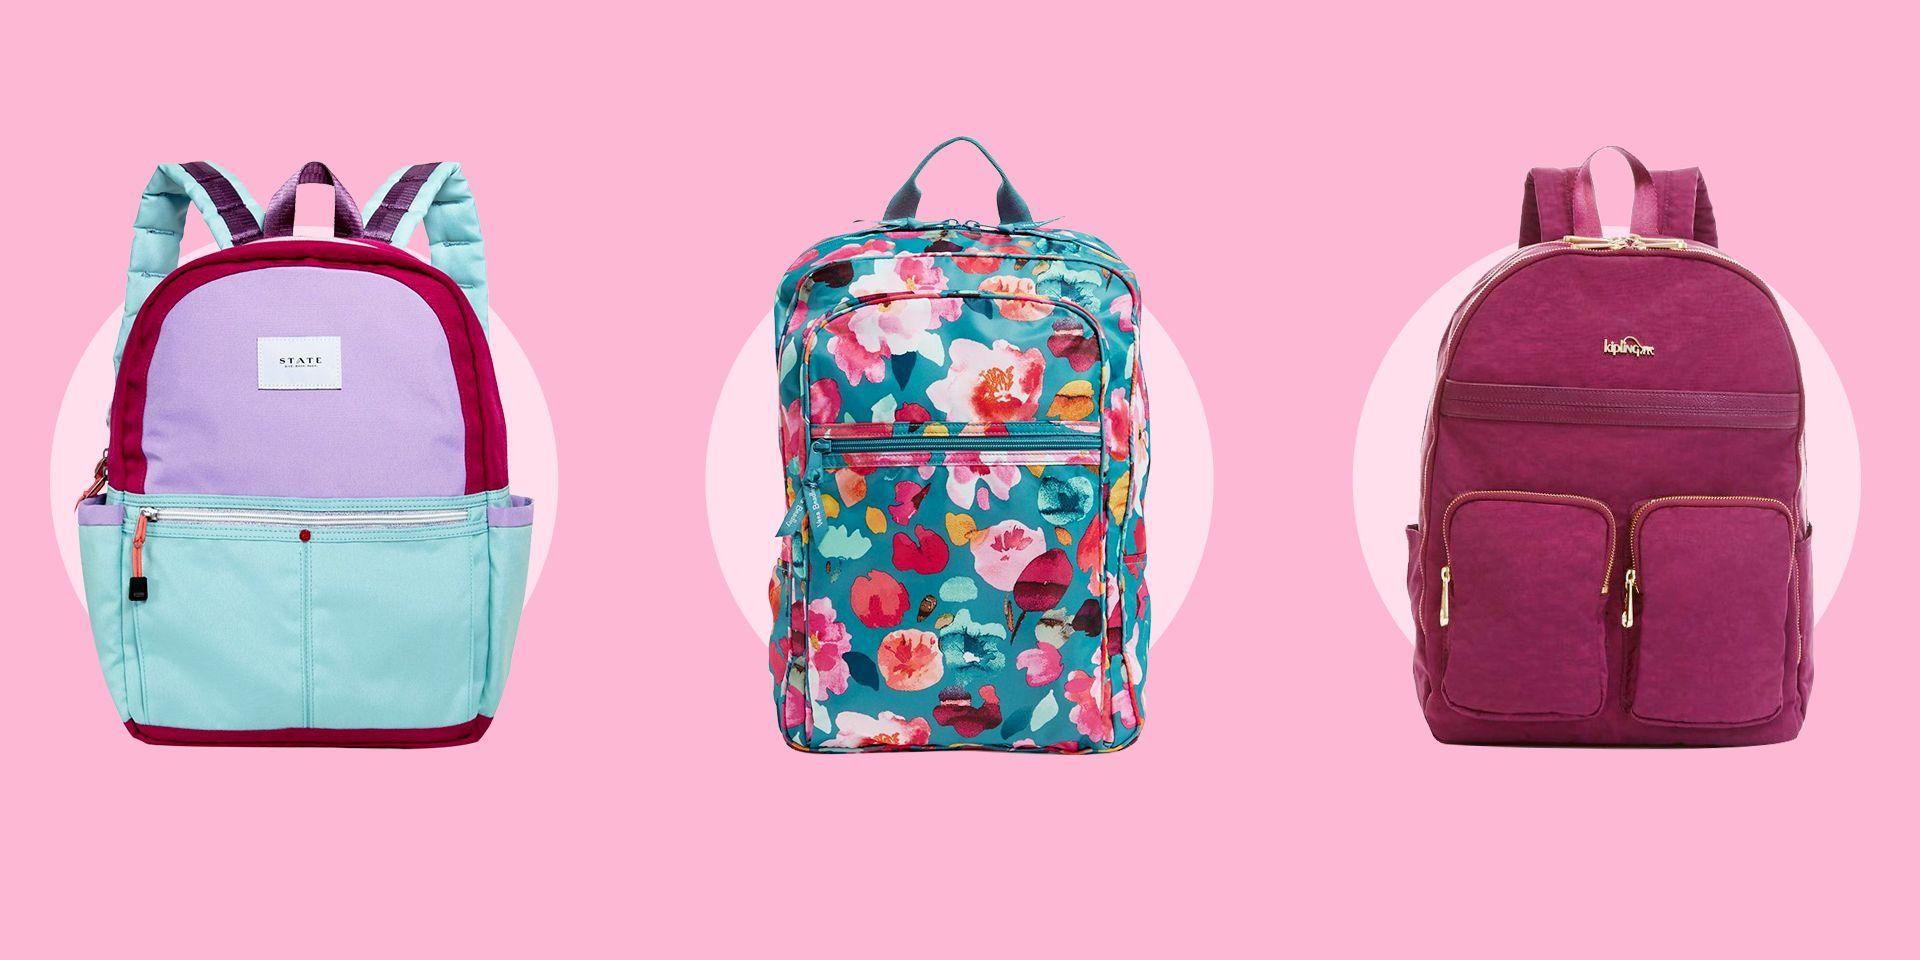 11 Best Bookbag Ideas images | Backpacks, Backpack bags, Bags